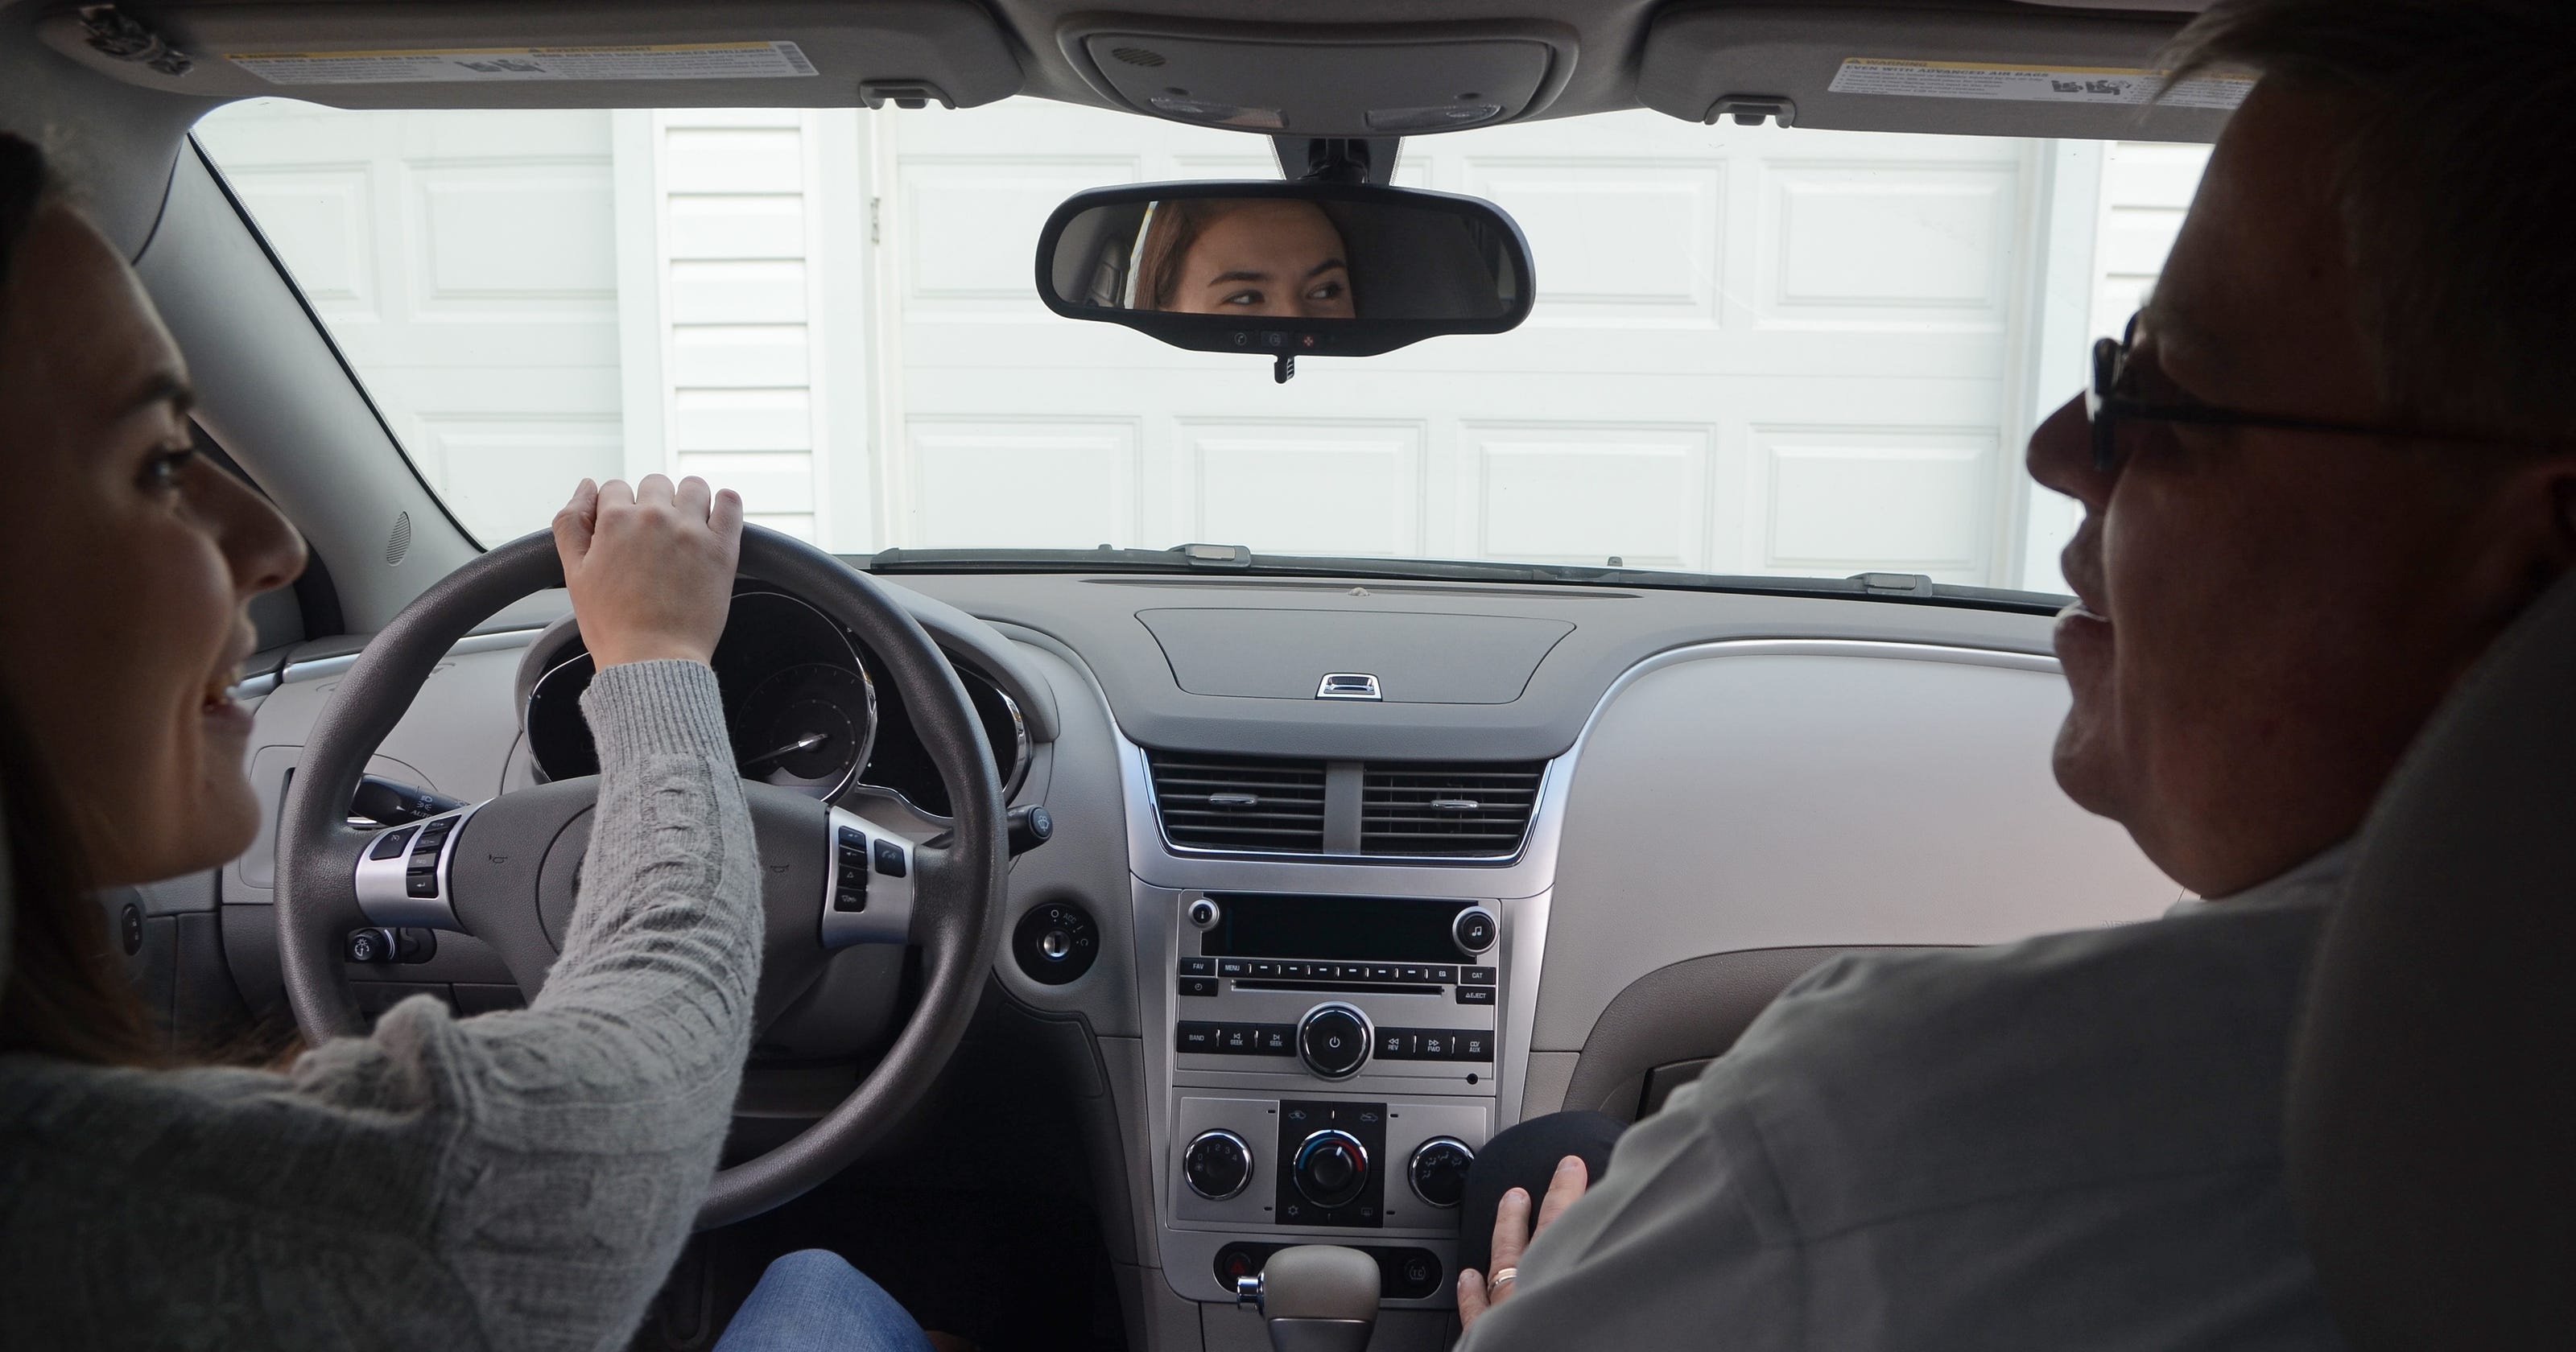 Off Teen Safe Driving 115